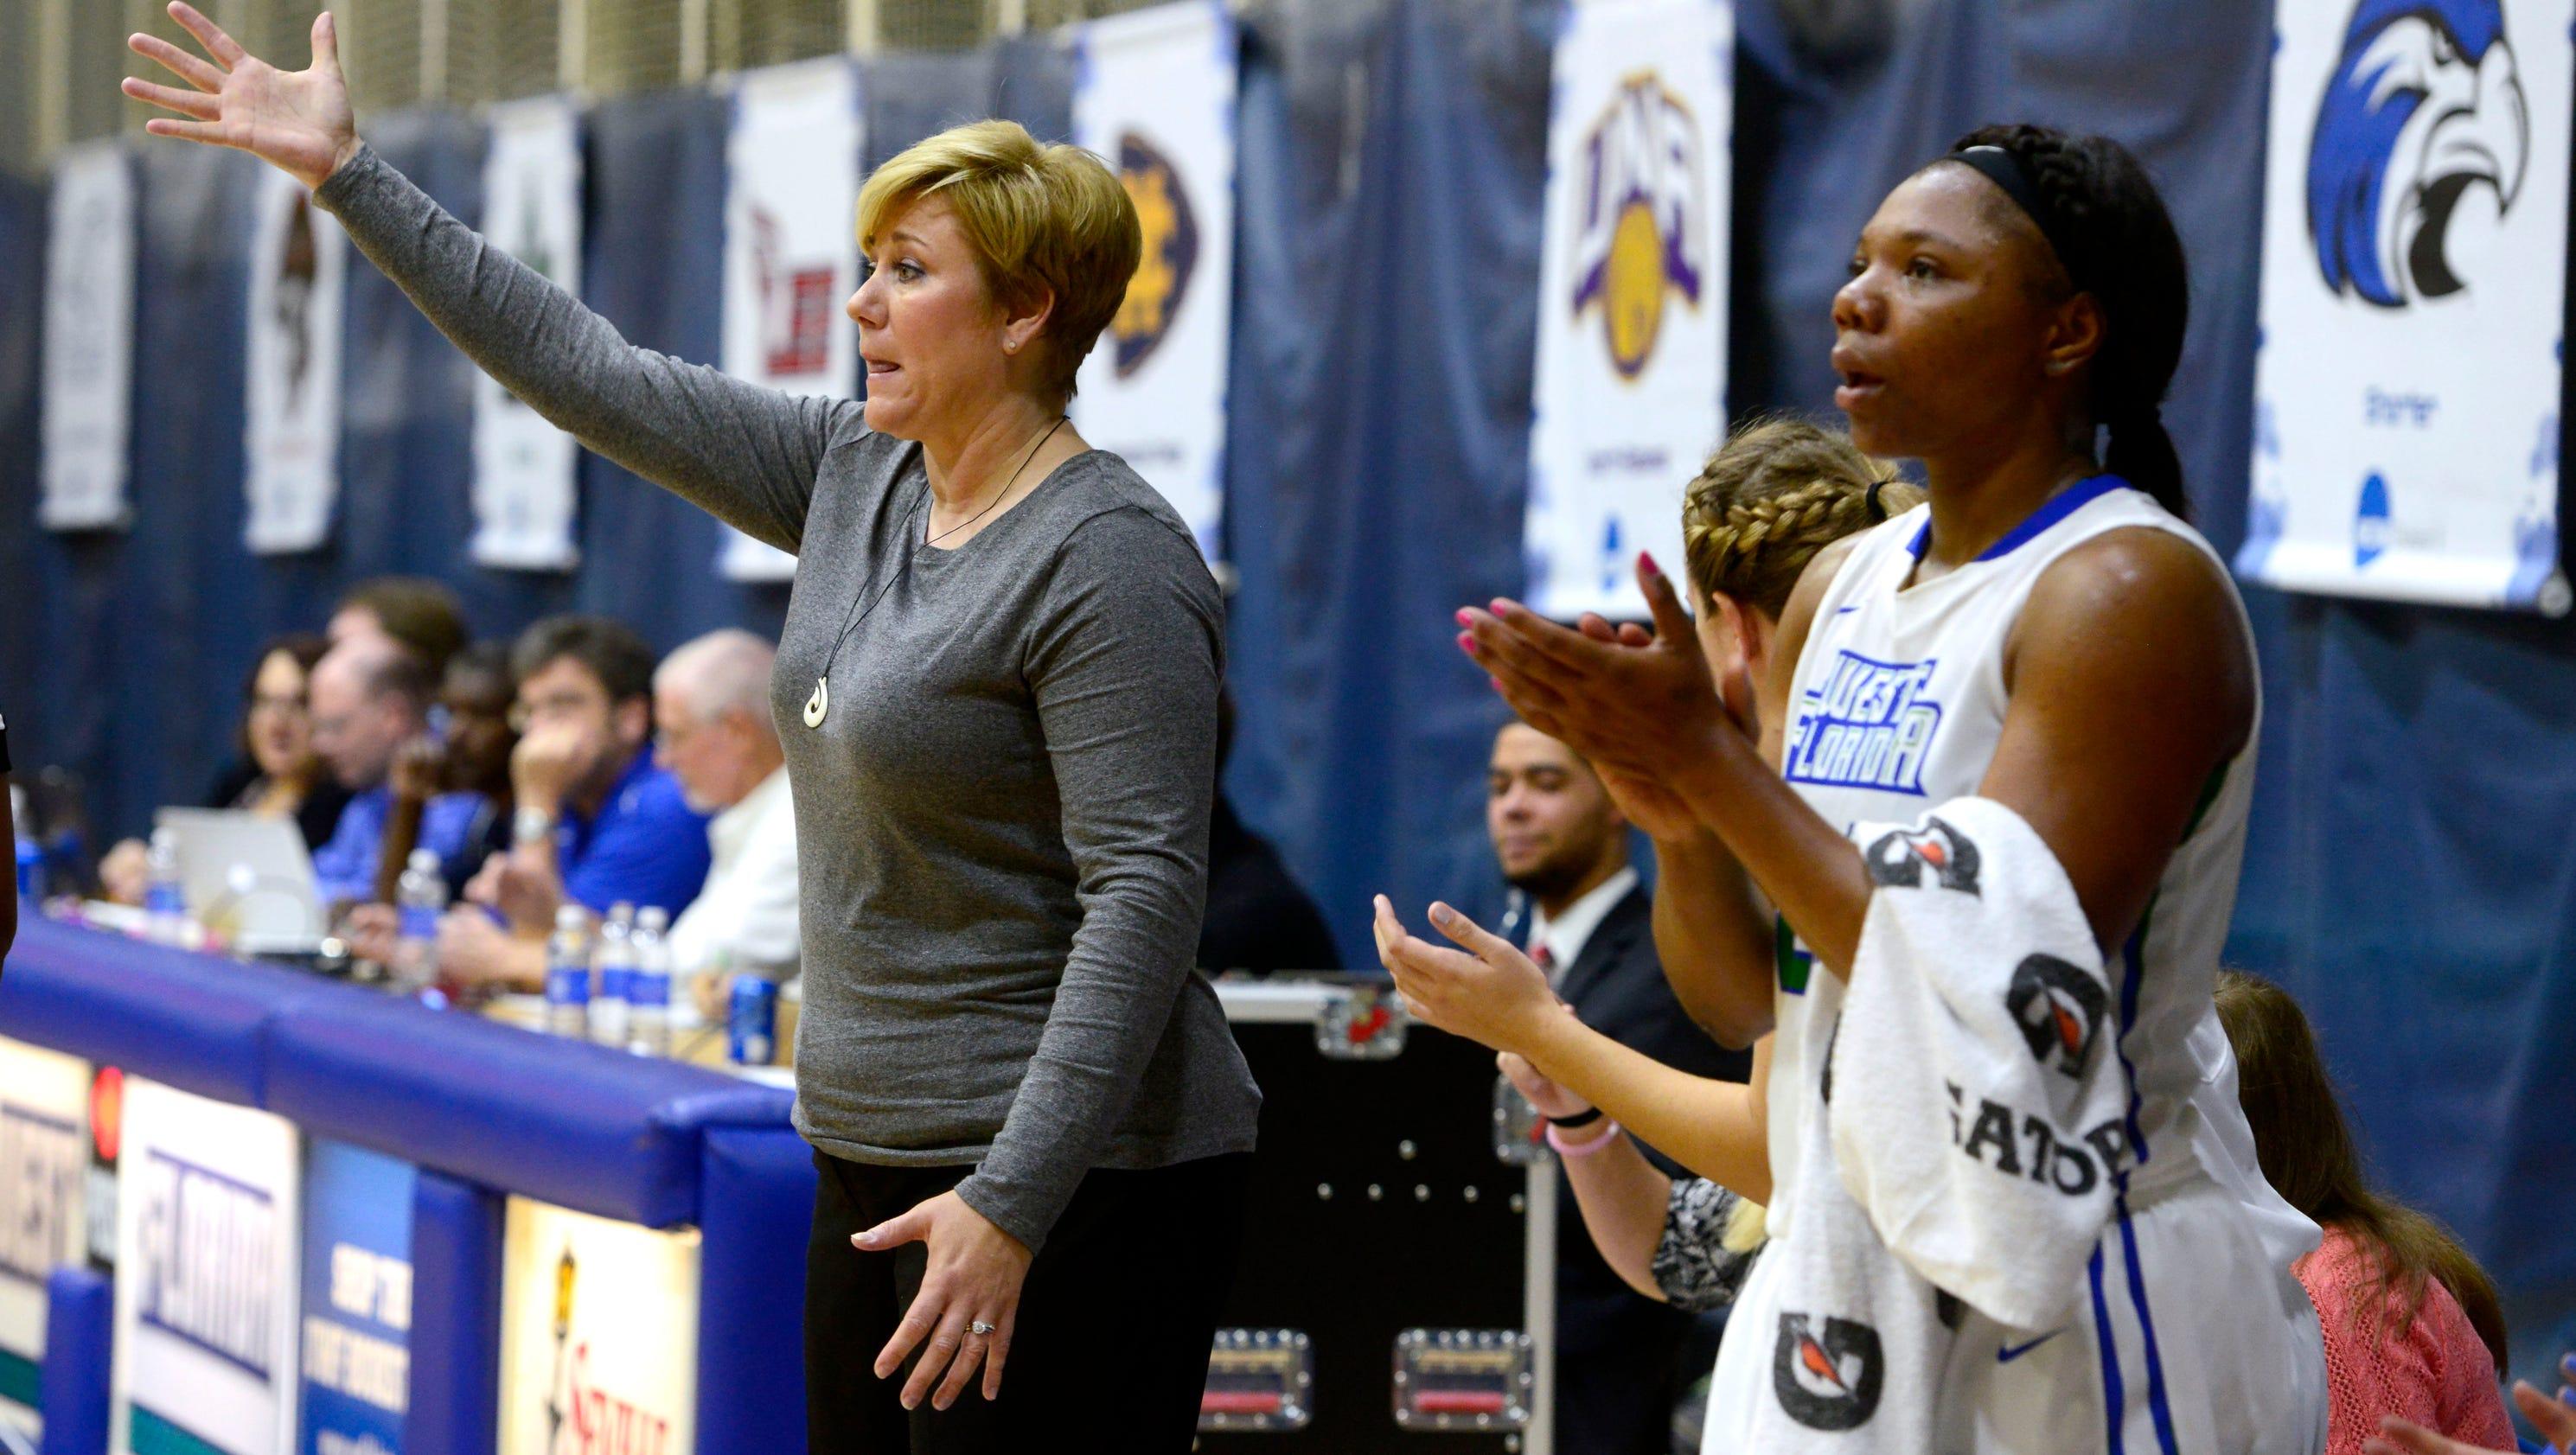 UWF women's basketball suffers its first loss of season